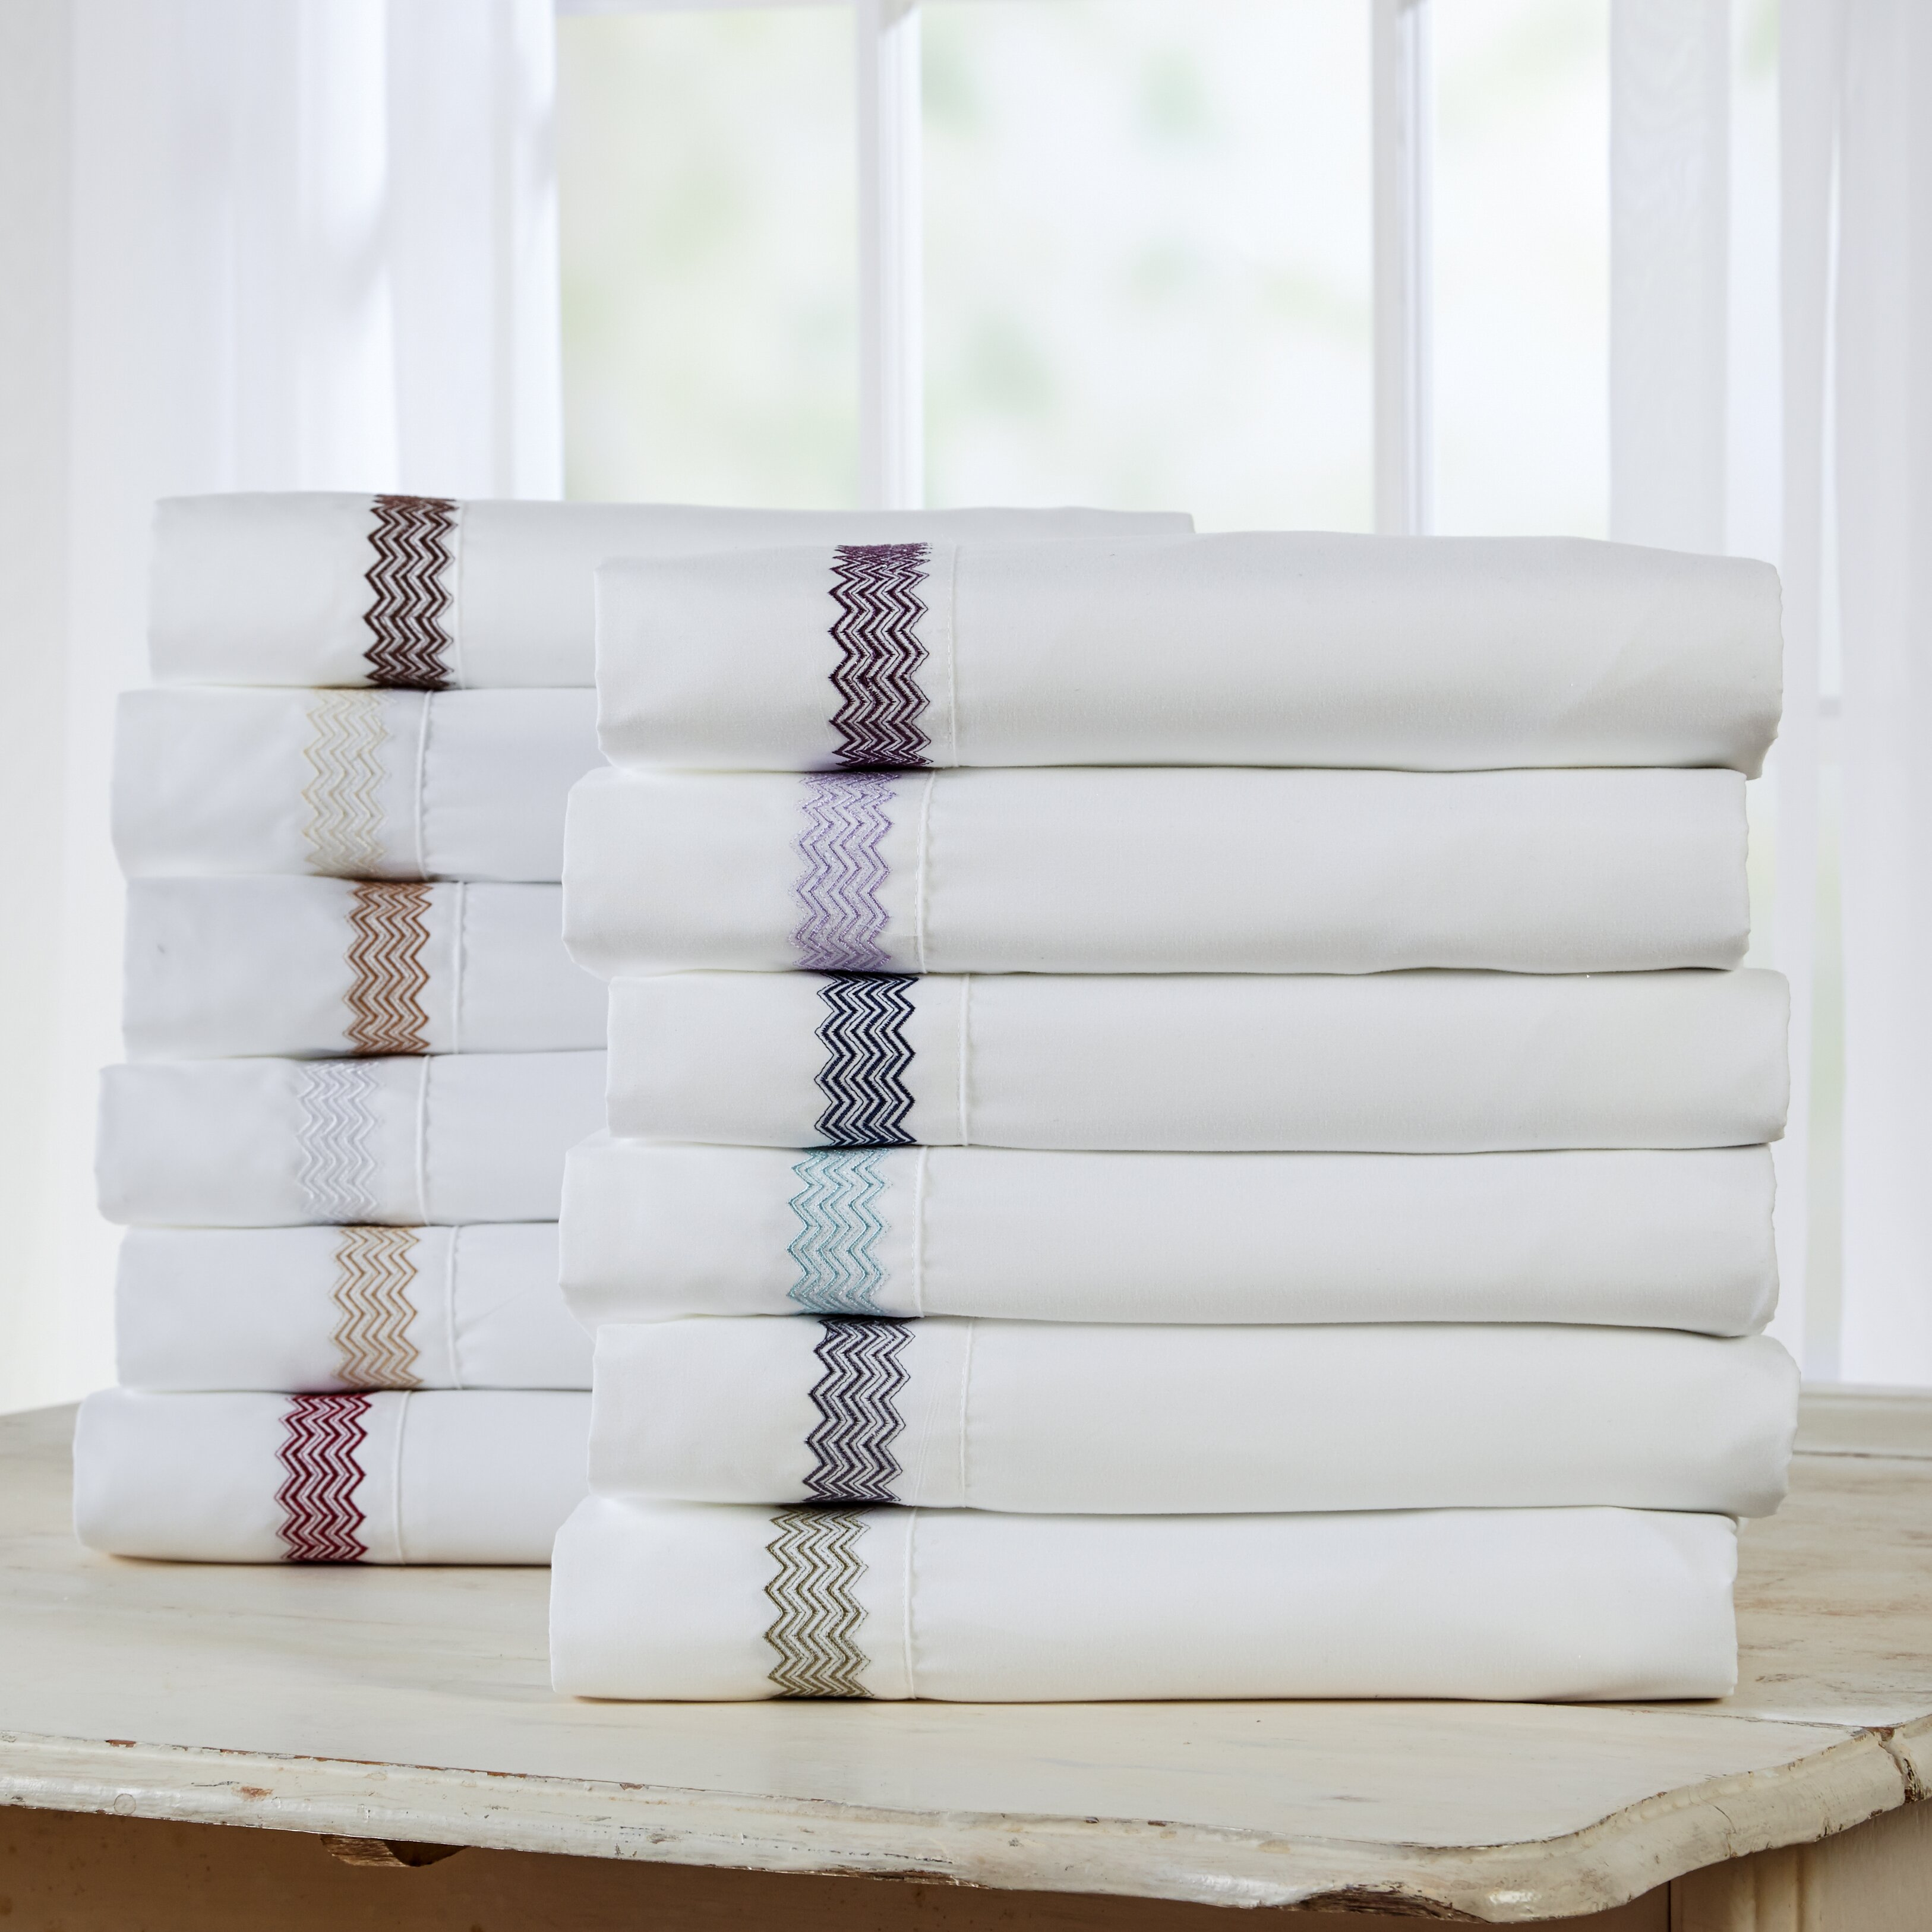 mercury row arriaga 1800 thread count sheet set reviews wayfair. Black Bedroom Furniture Sets. Home Design Ideas